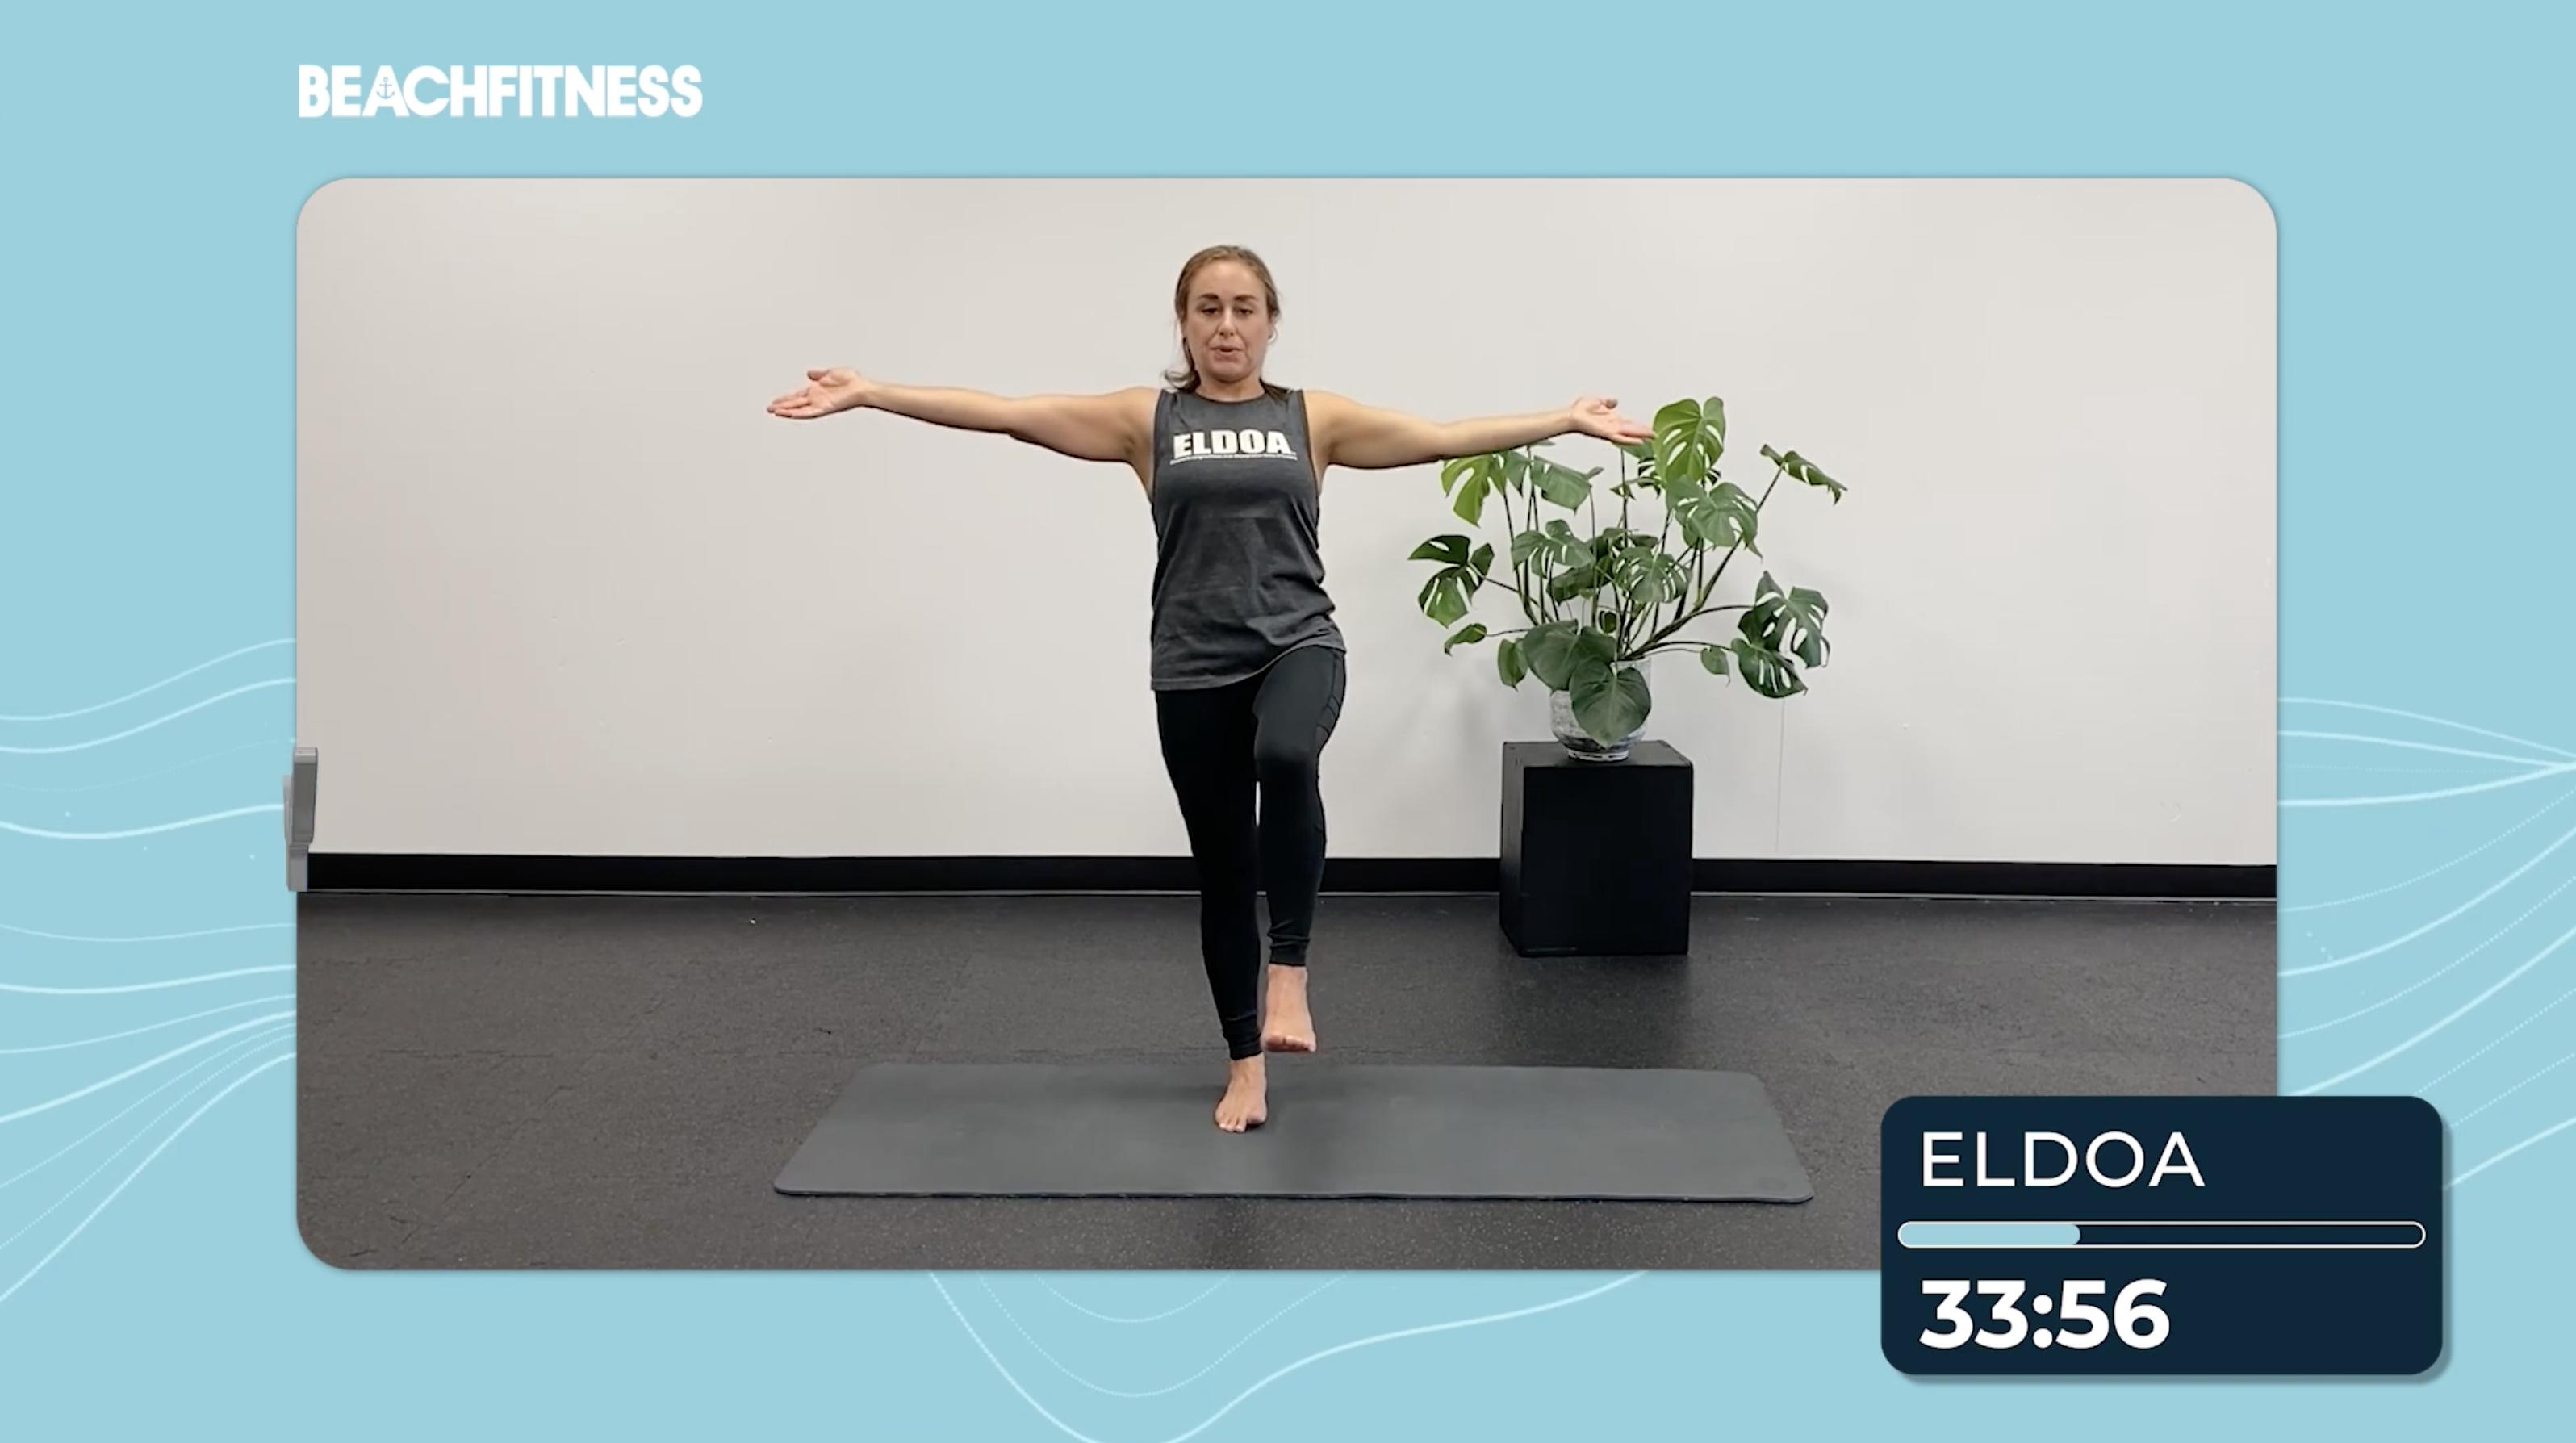 ELDOA | Strengh and Balance